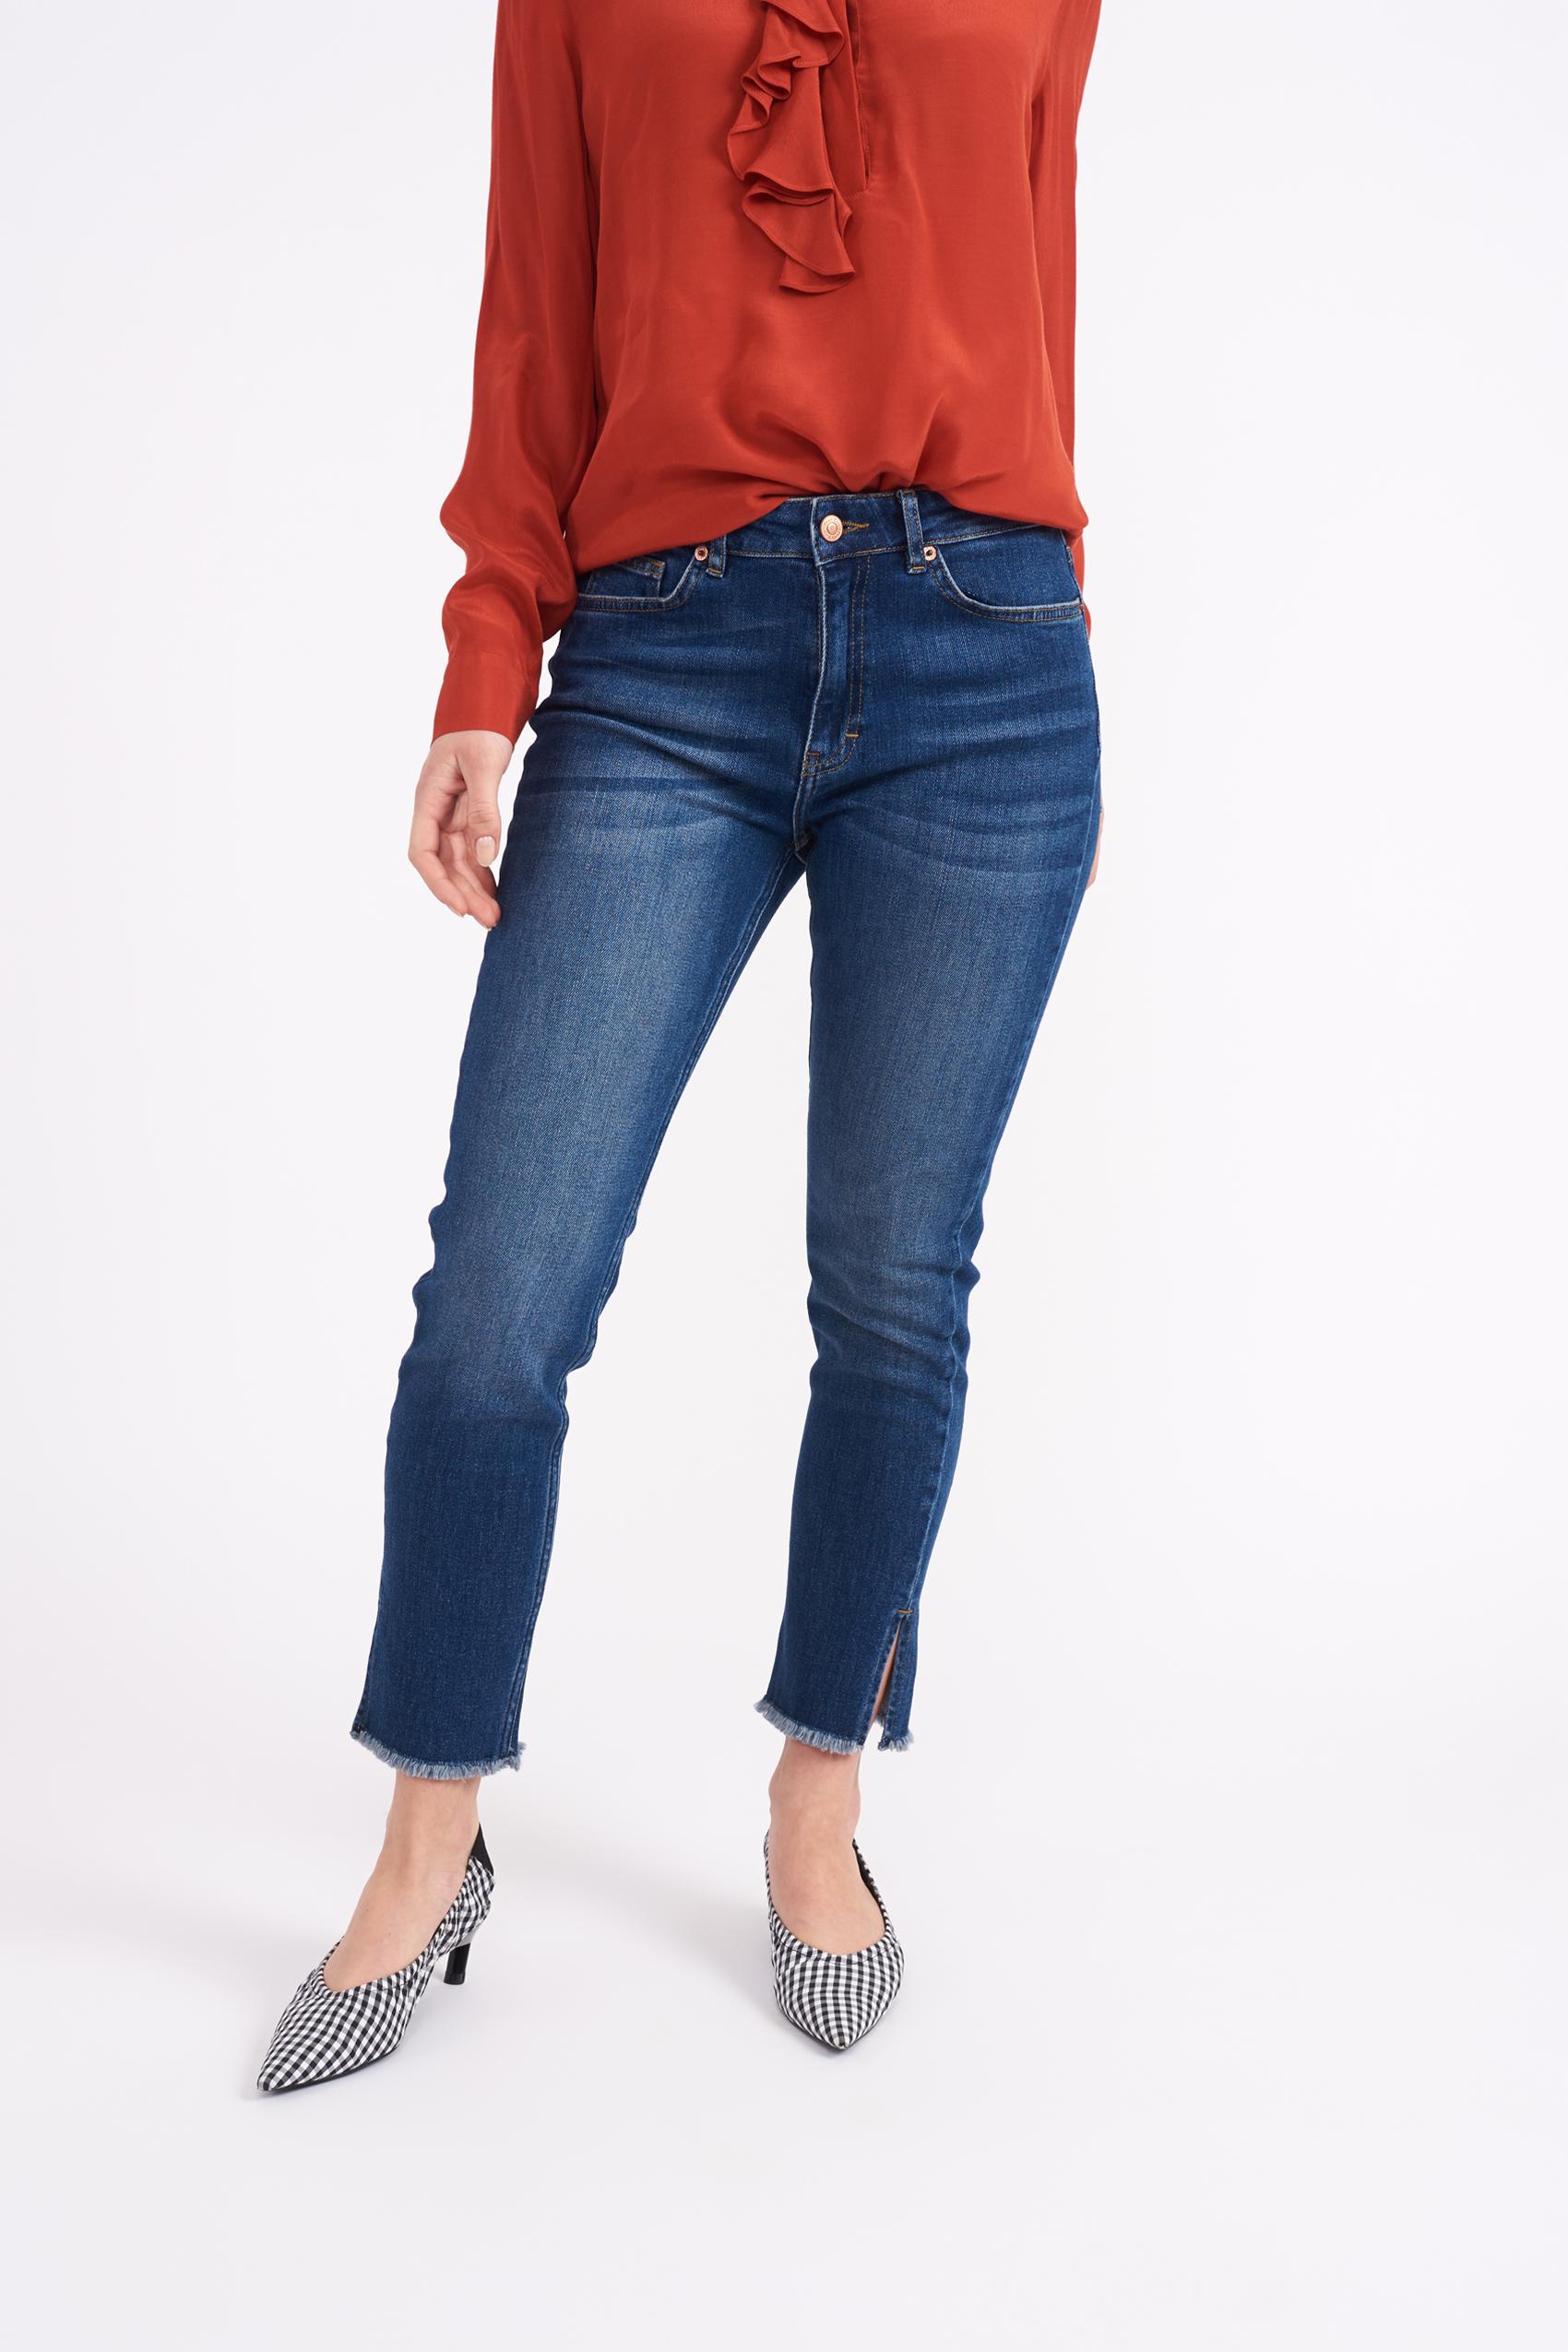 3aeb76e0c9b Jeans dam - Damjeans online - MQ